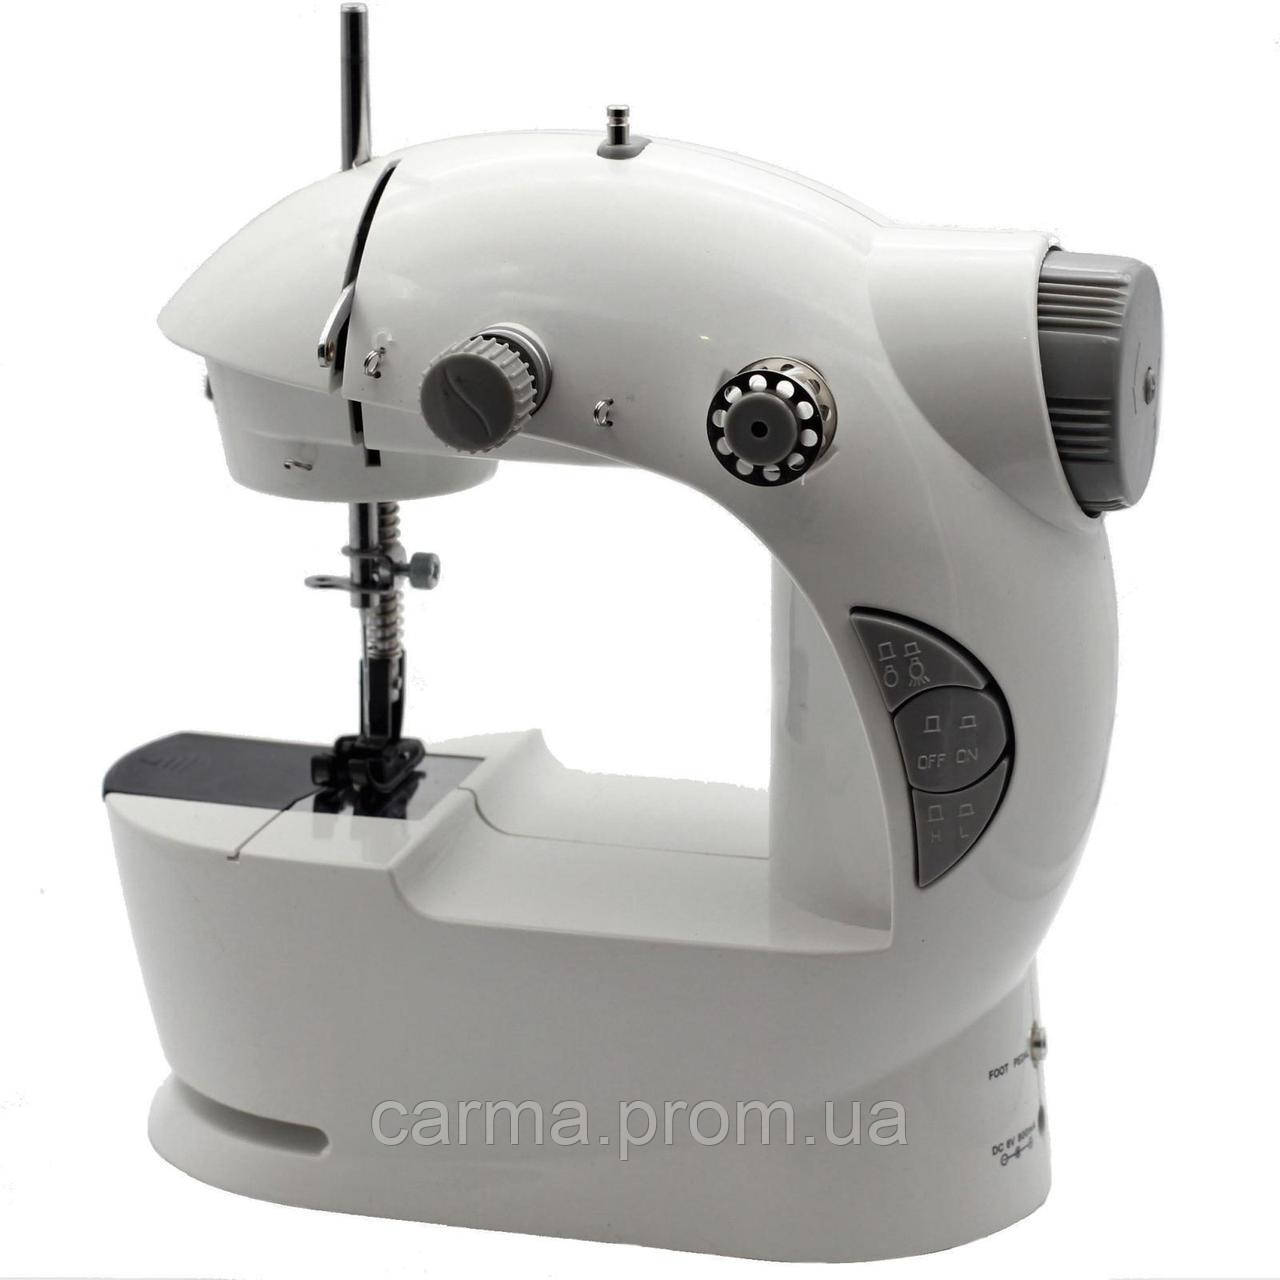 Швейная машинка Mini Sewing Mashine 4в1 Белая